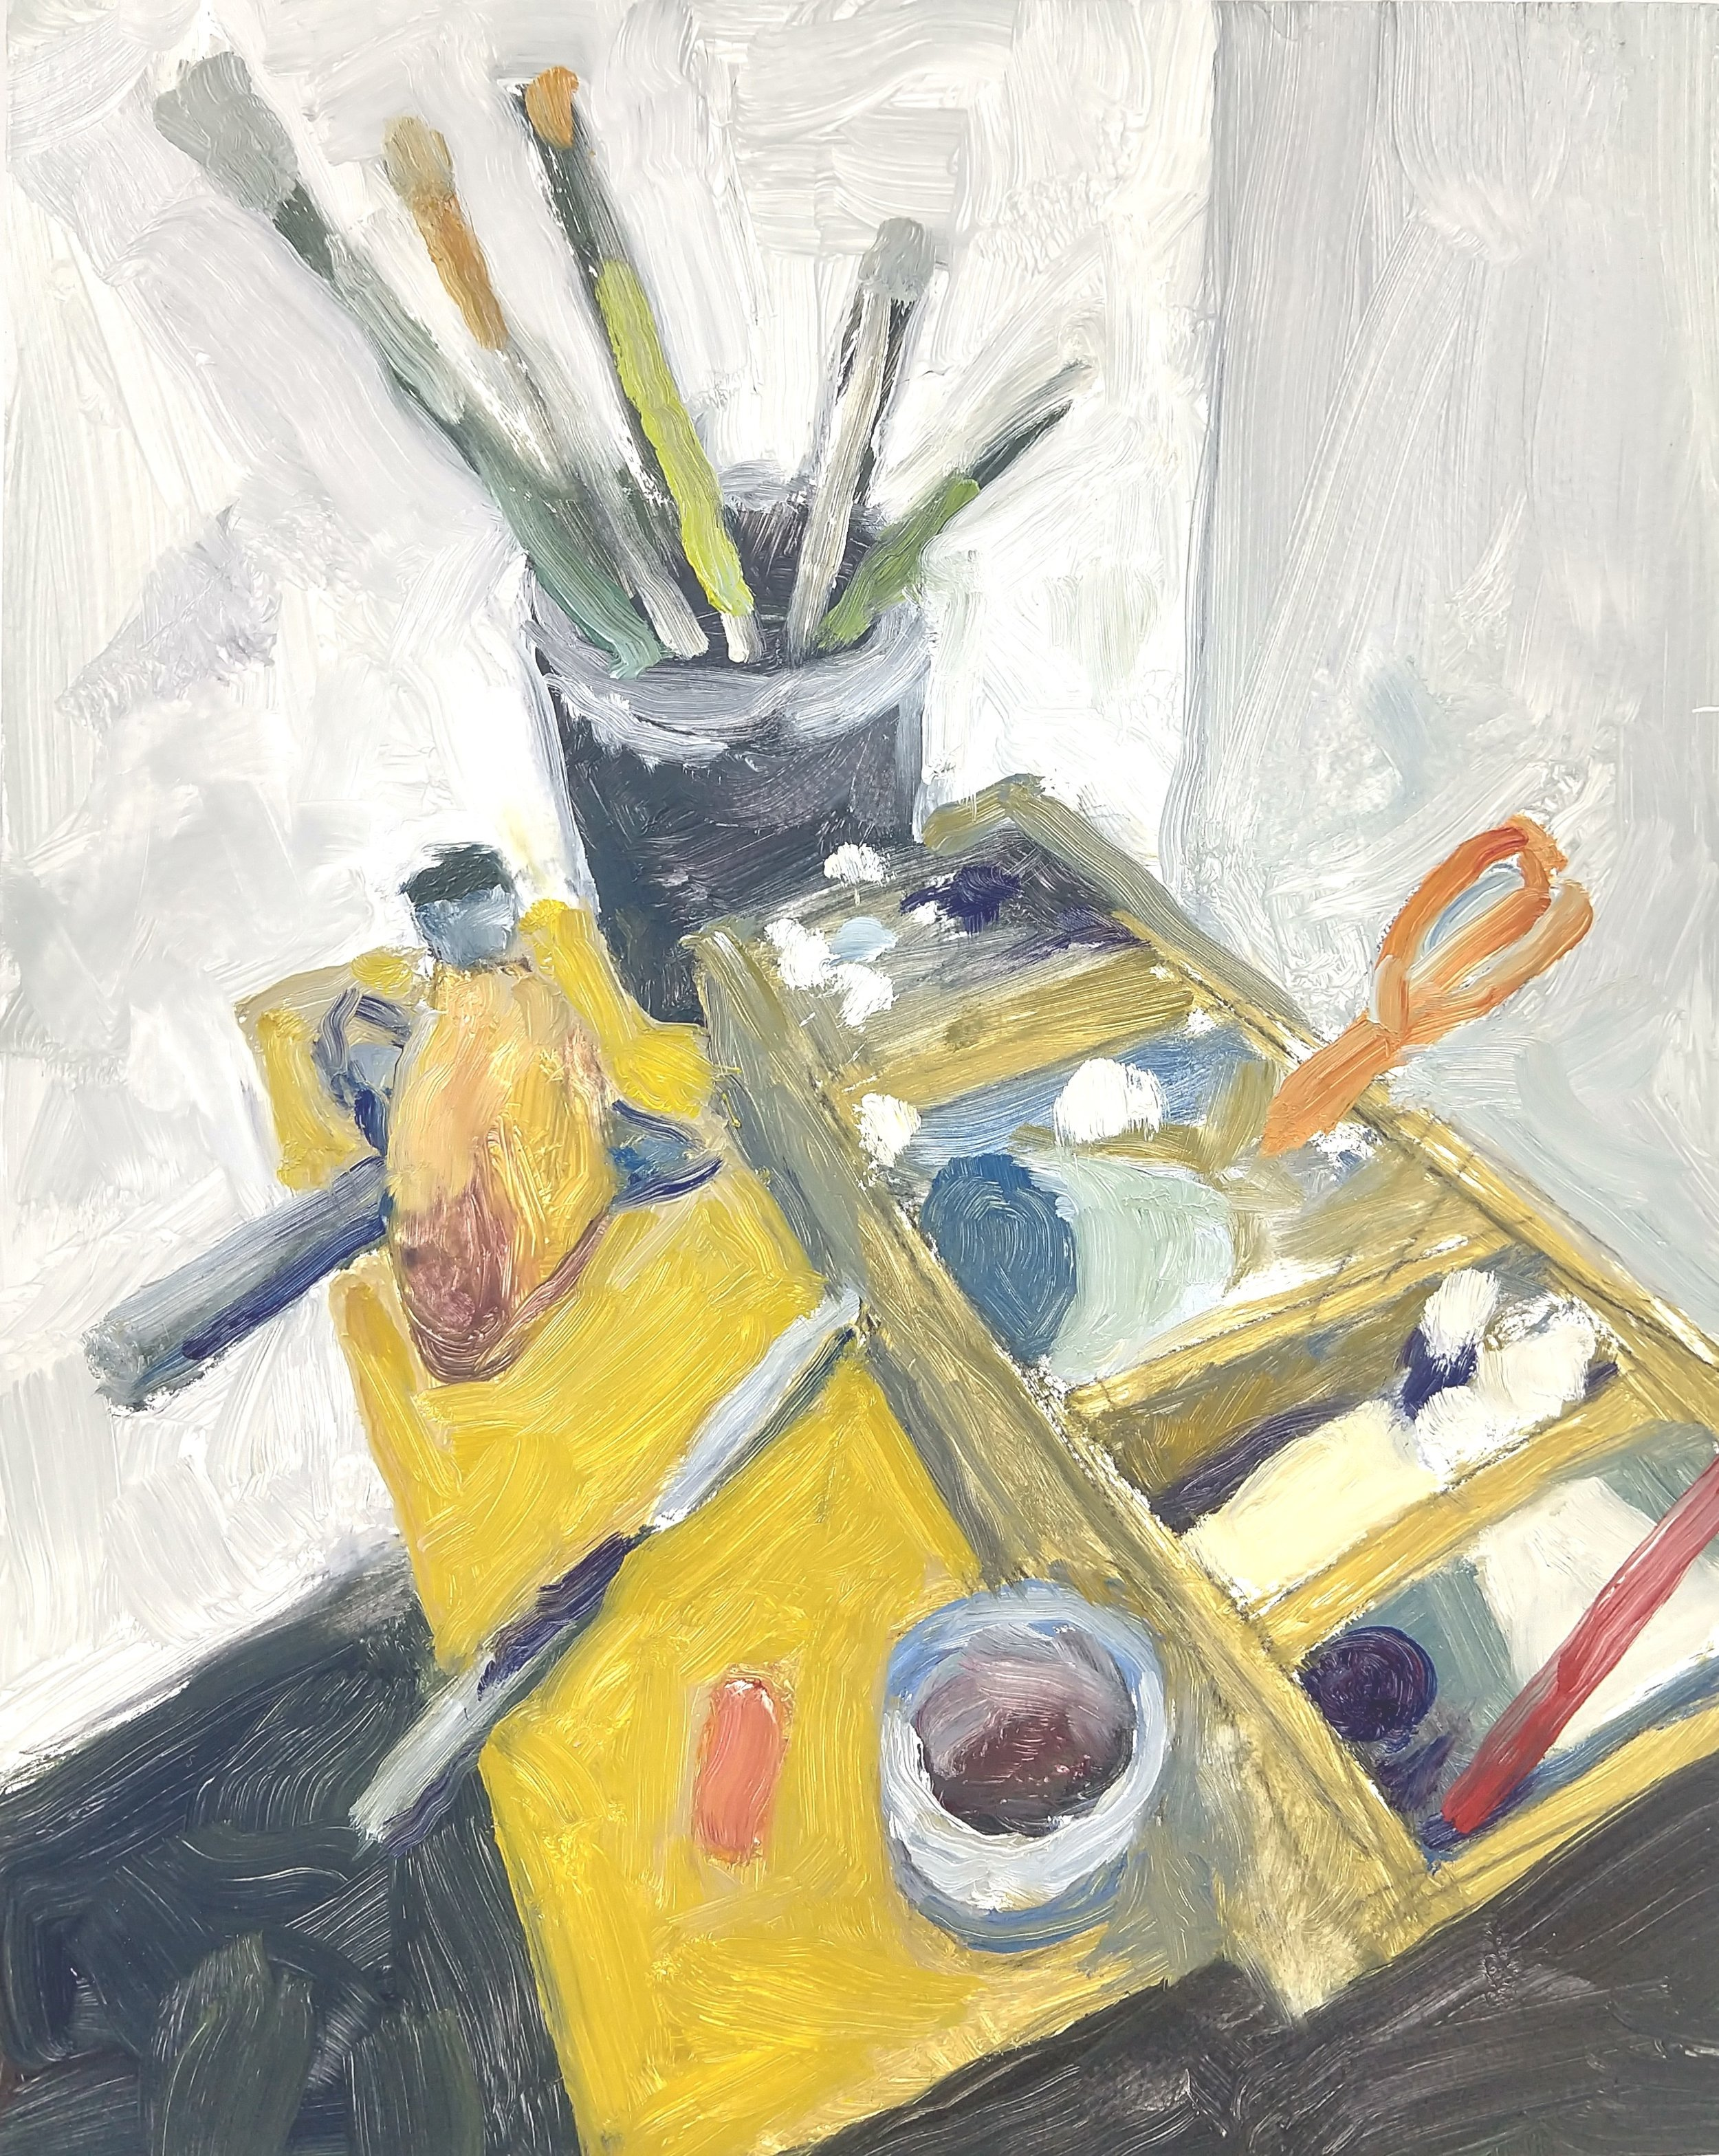 Artist's Tools, Robert Ross, 10x8 in, oil.jpg